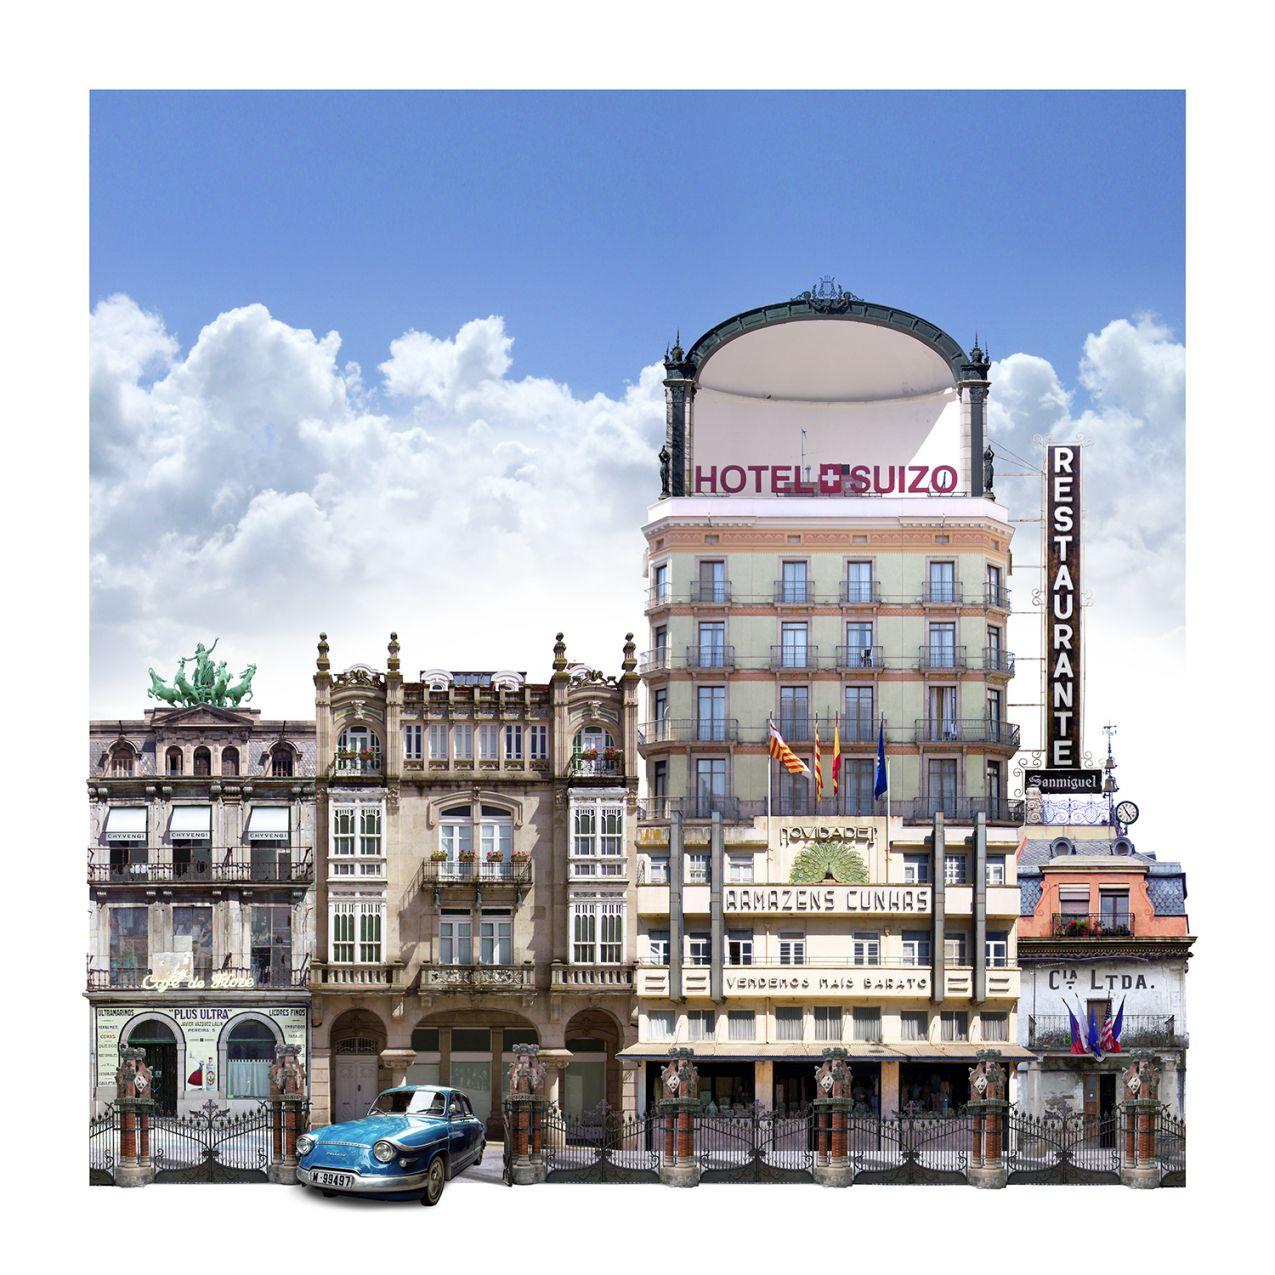 hotel (2011) - Antonio Suárez Estévez - Antonio Suárez